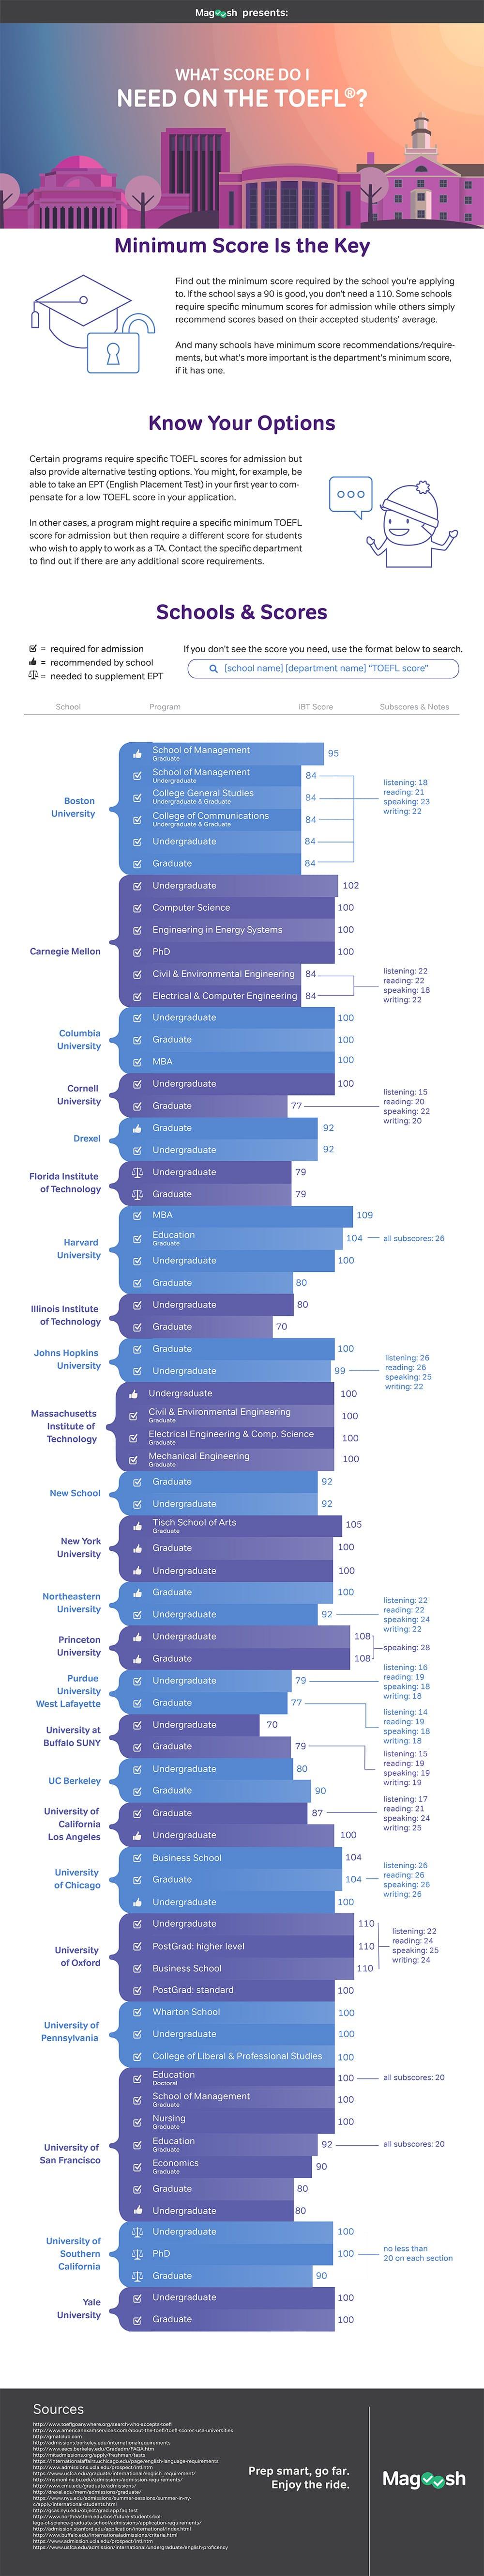 TOEFL Scores Infographic-magoosh